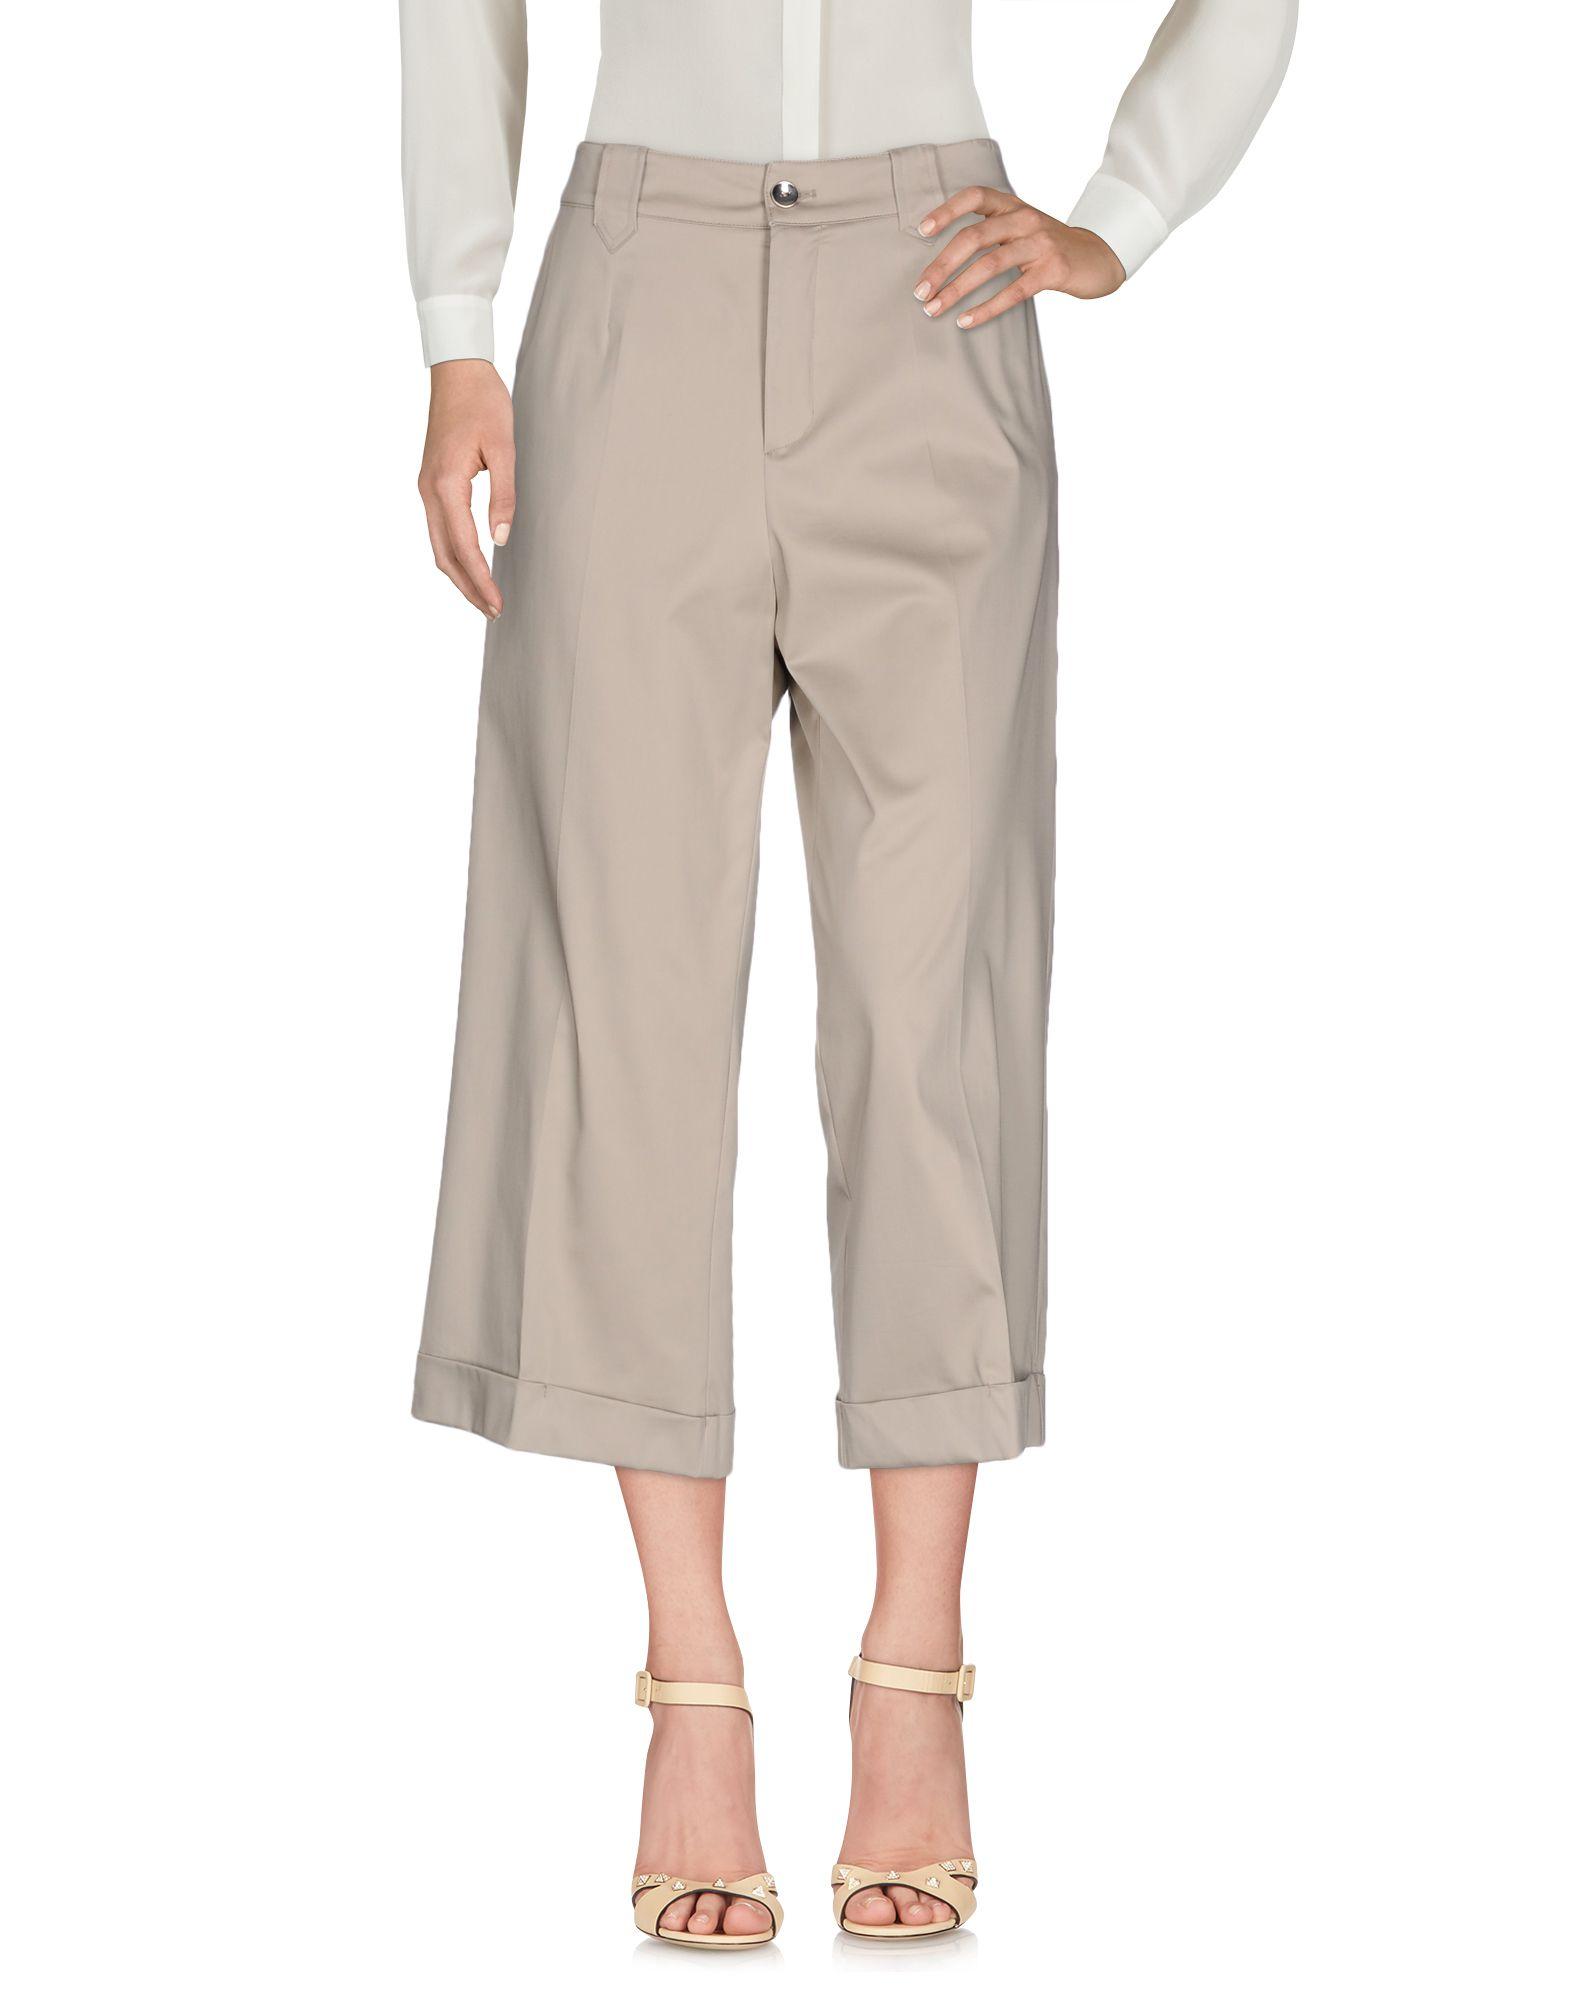 PRIVE' ITALIA Брюки-капри h2o italia джинсовые брюки